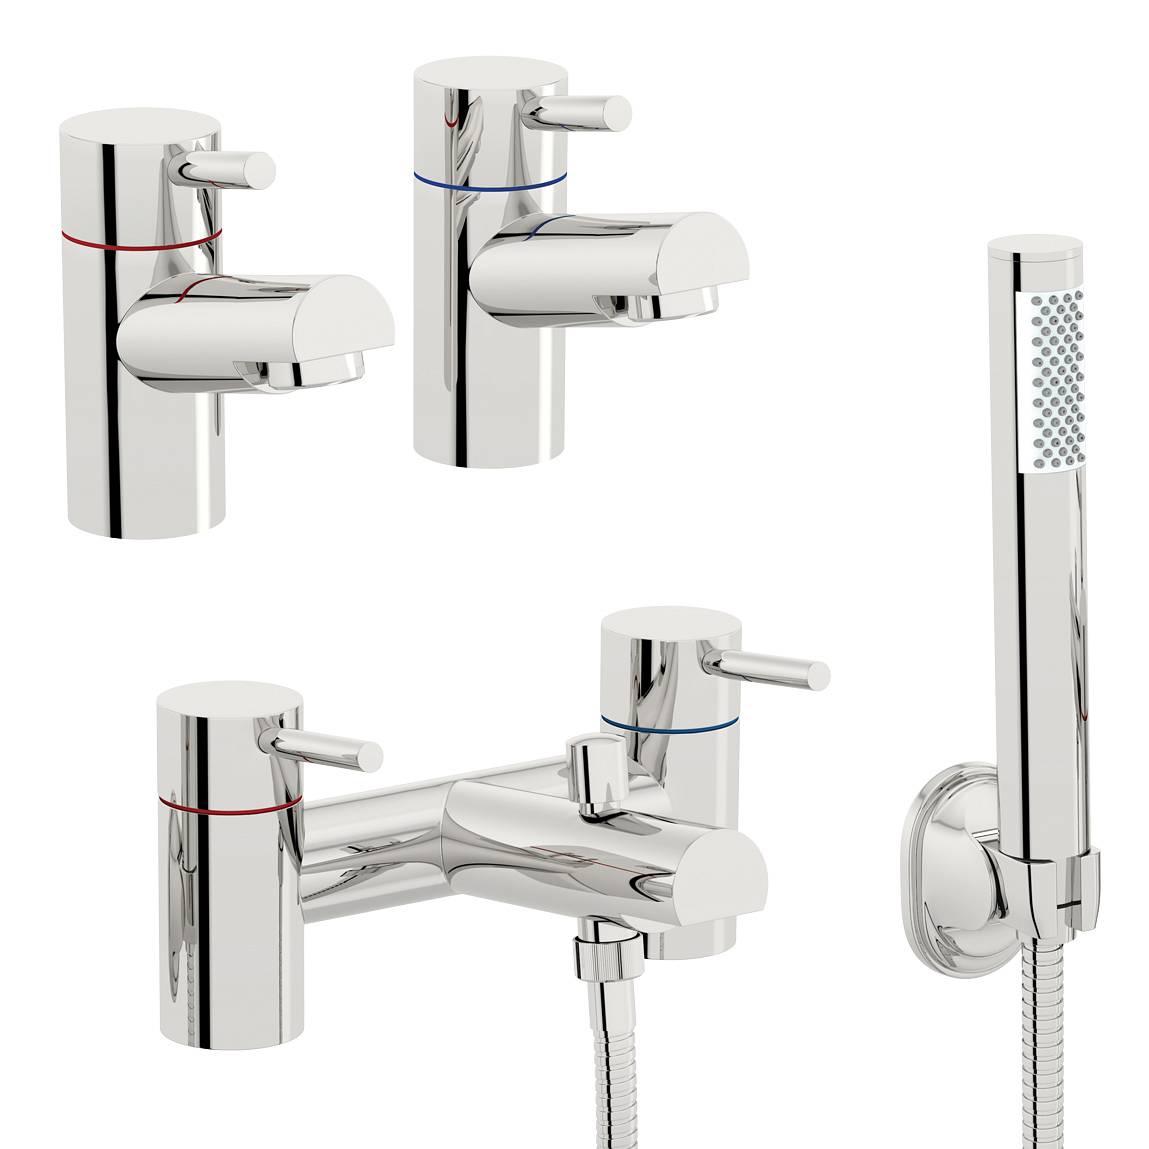 Image of Matrix Basin Tap and Bath Shower Mixer Pack